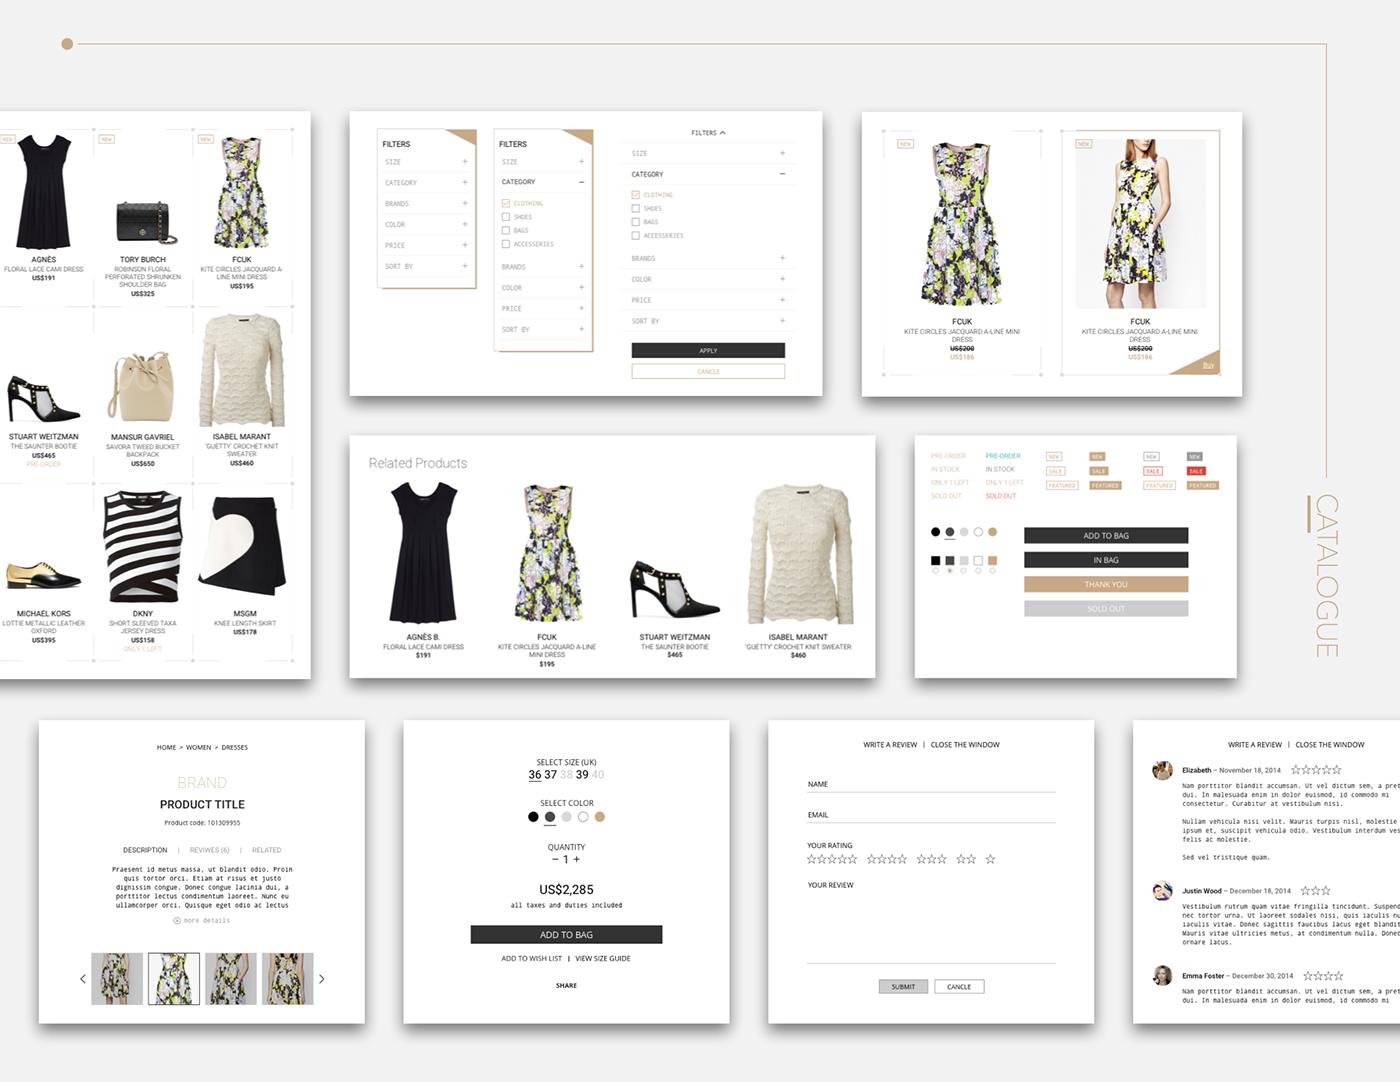 UI ux Ecommerce shop Responsive Website mobile tablet clean elegant sketch Interface interaction Web